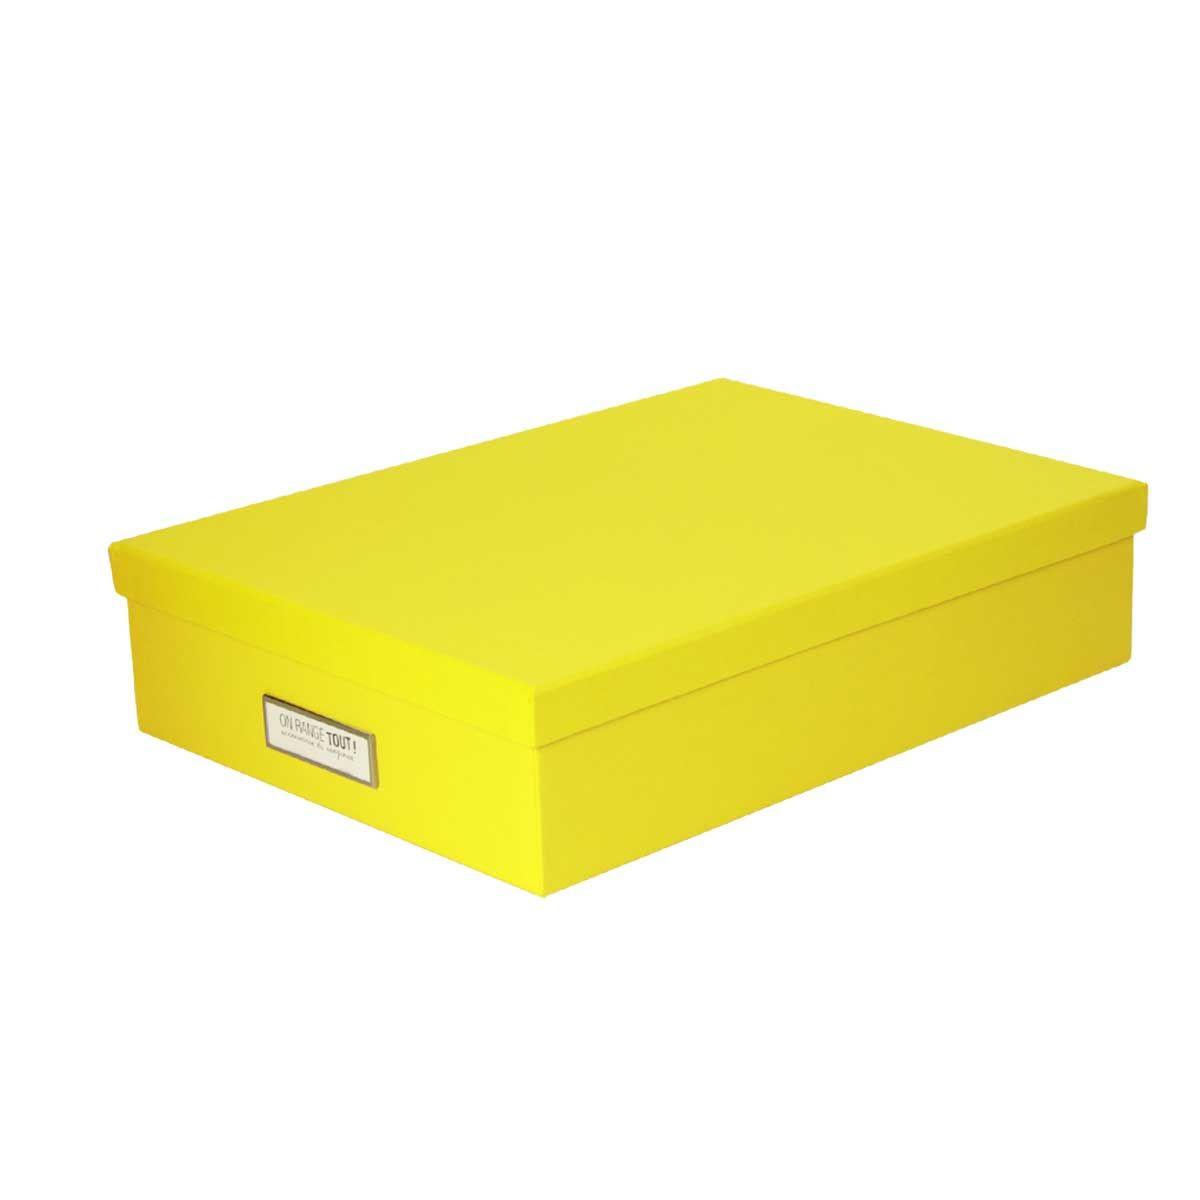 bo te de rangement a4 carton jaune. Black Bedroom Furniture Sets. Home Design Ideas